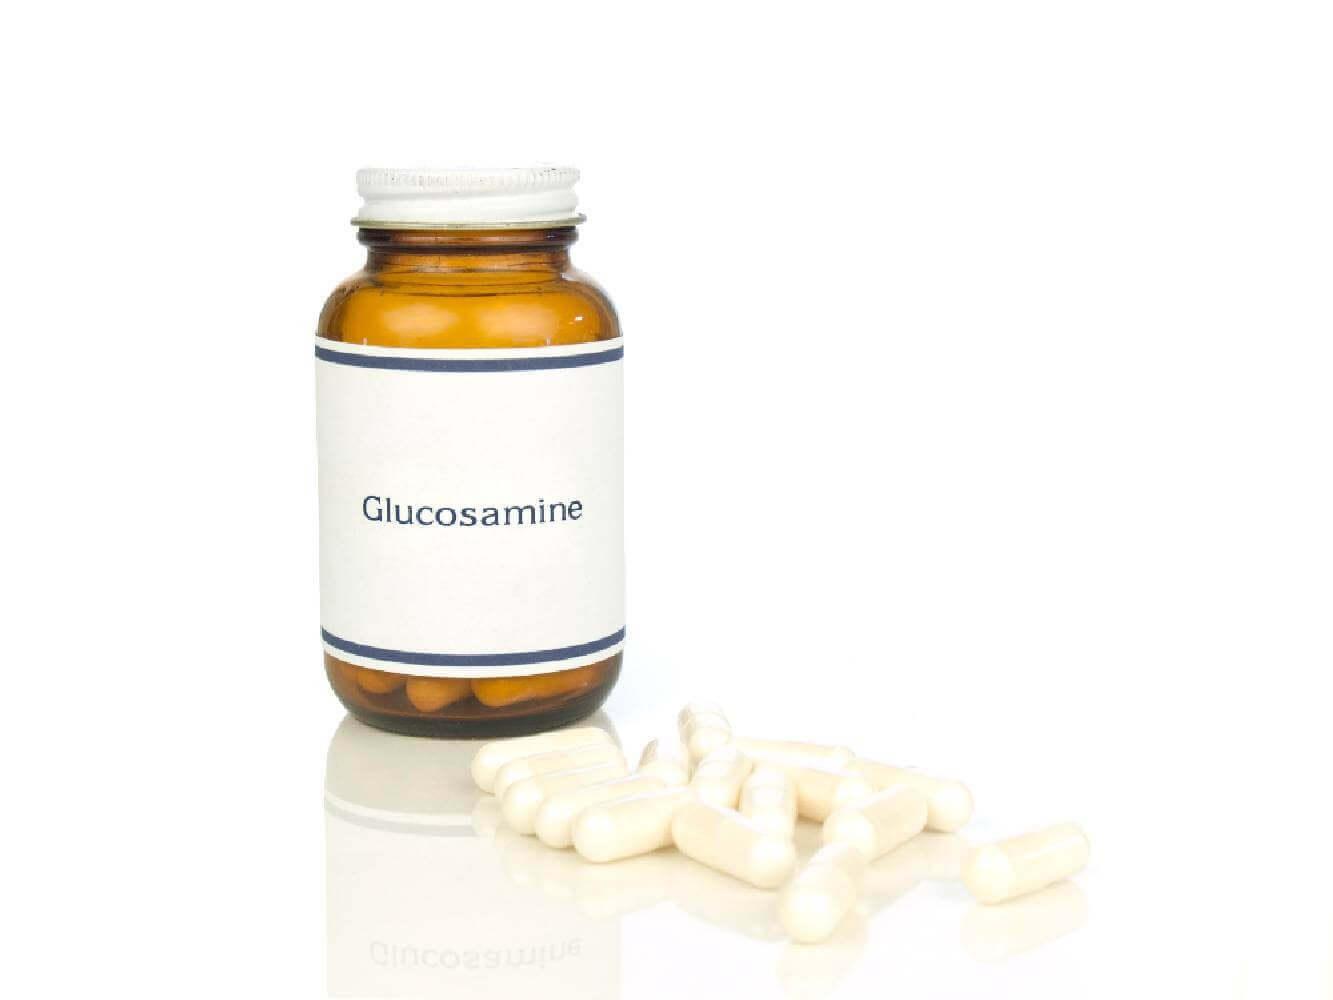 image de l'ingredient Glucosamine